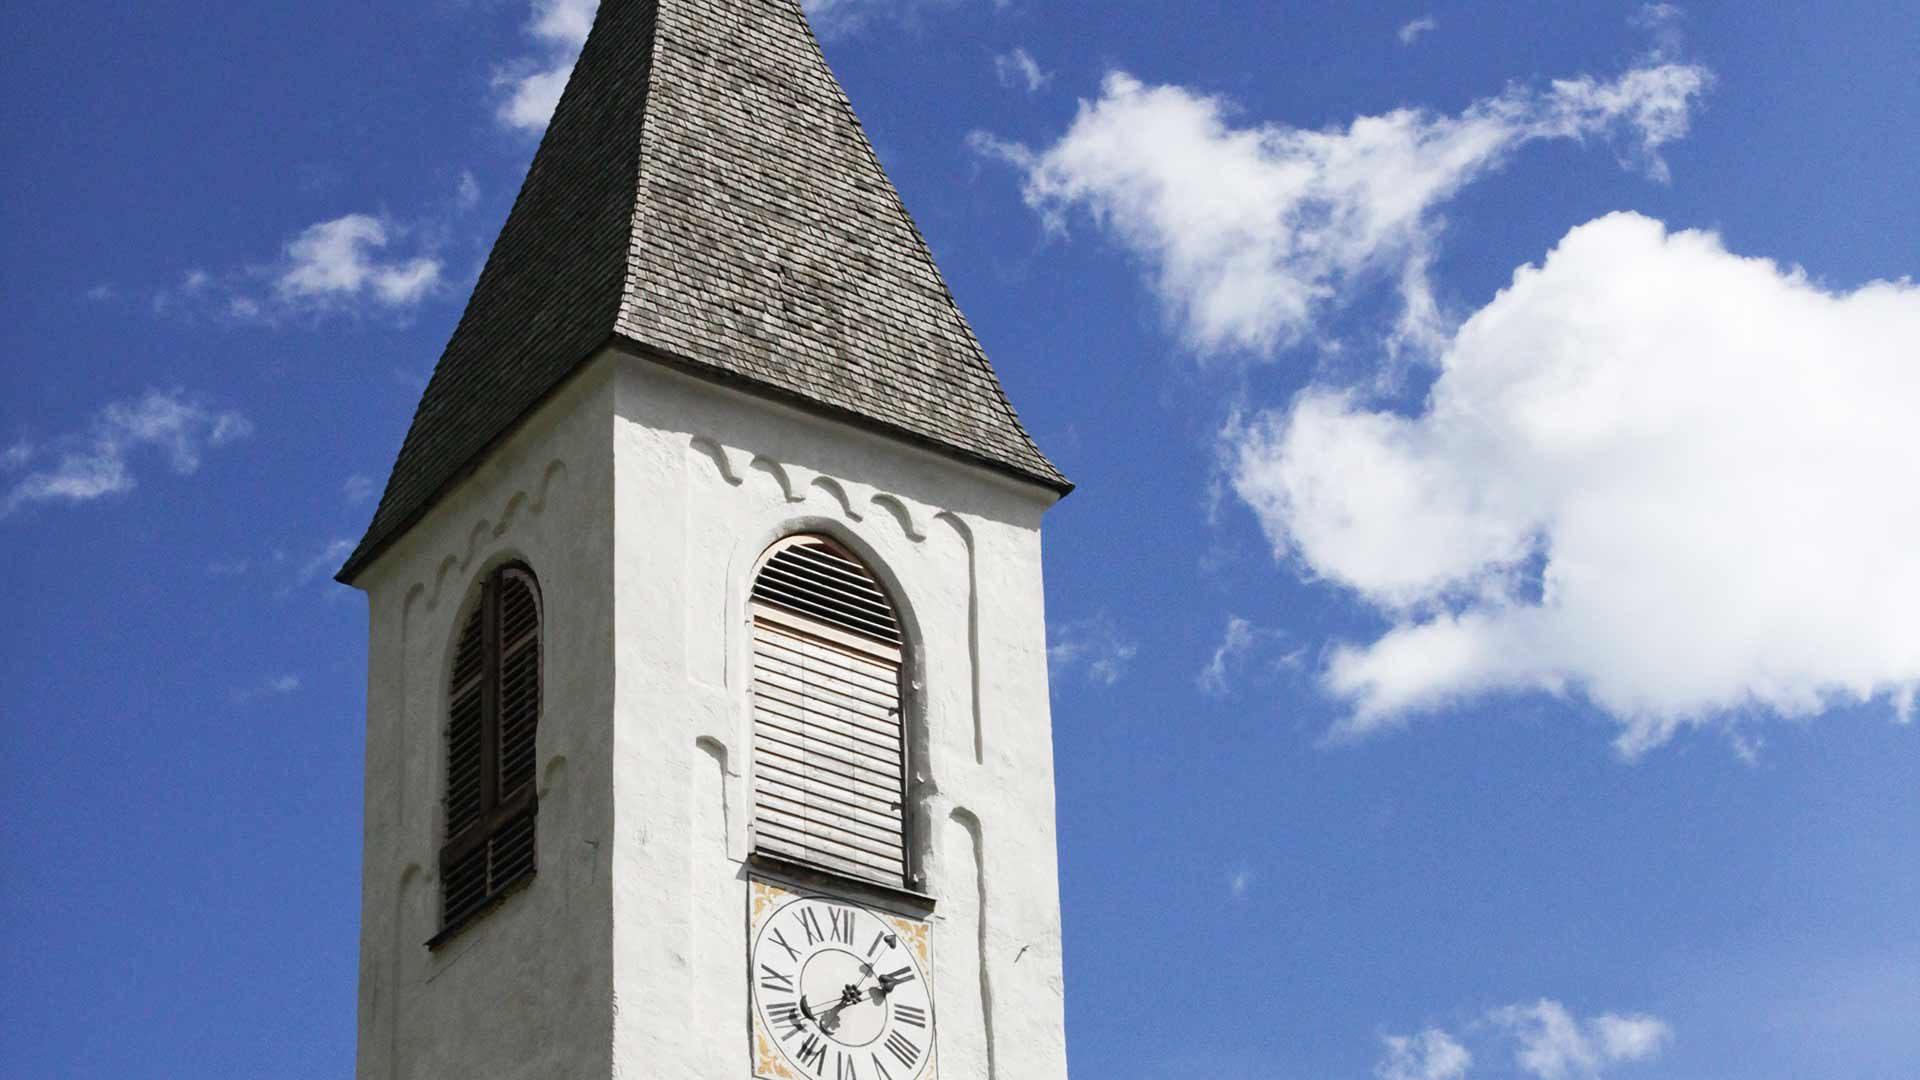 Chiesa parrocchiale di Santa Valburga